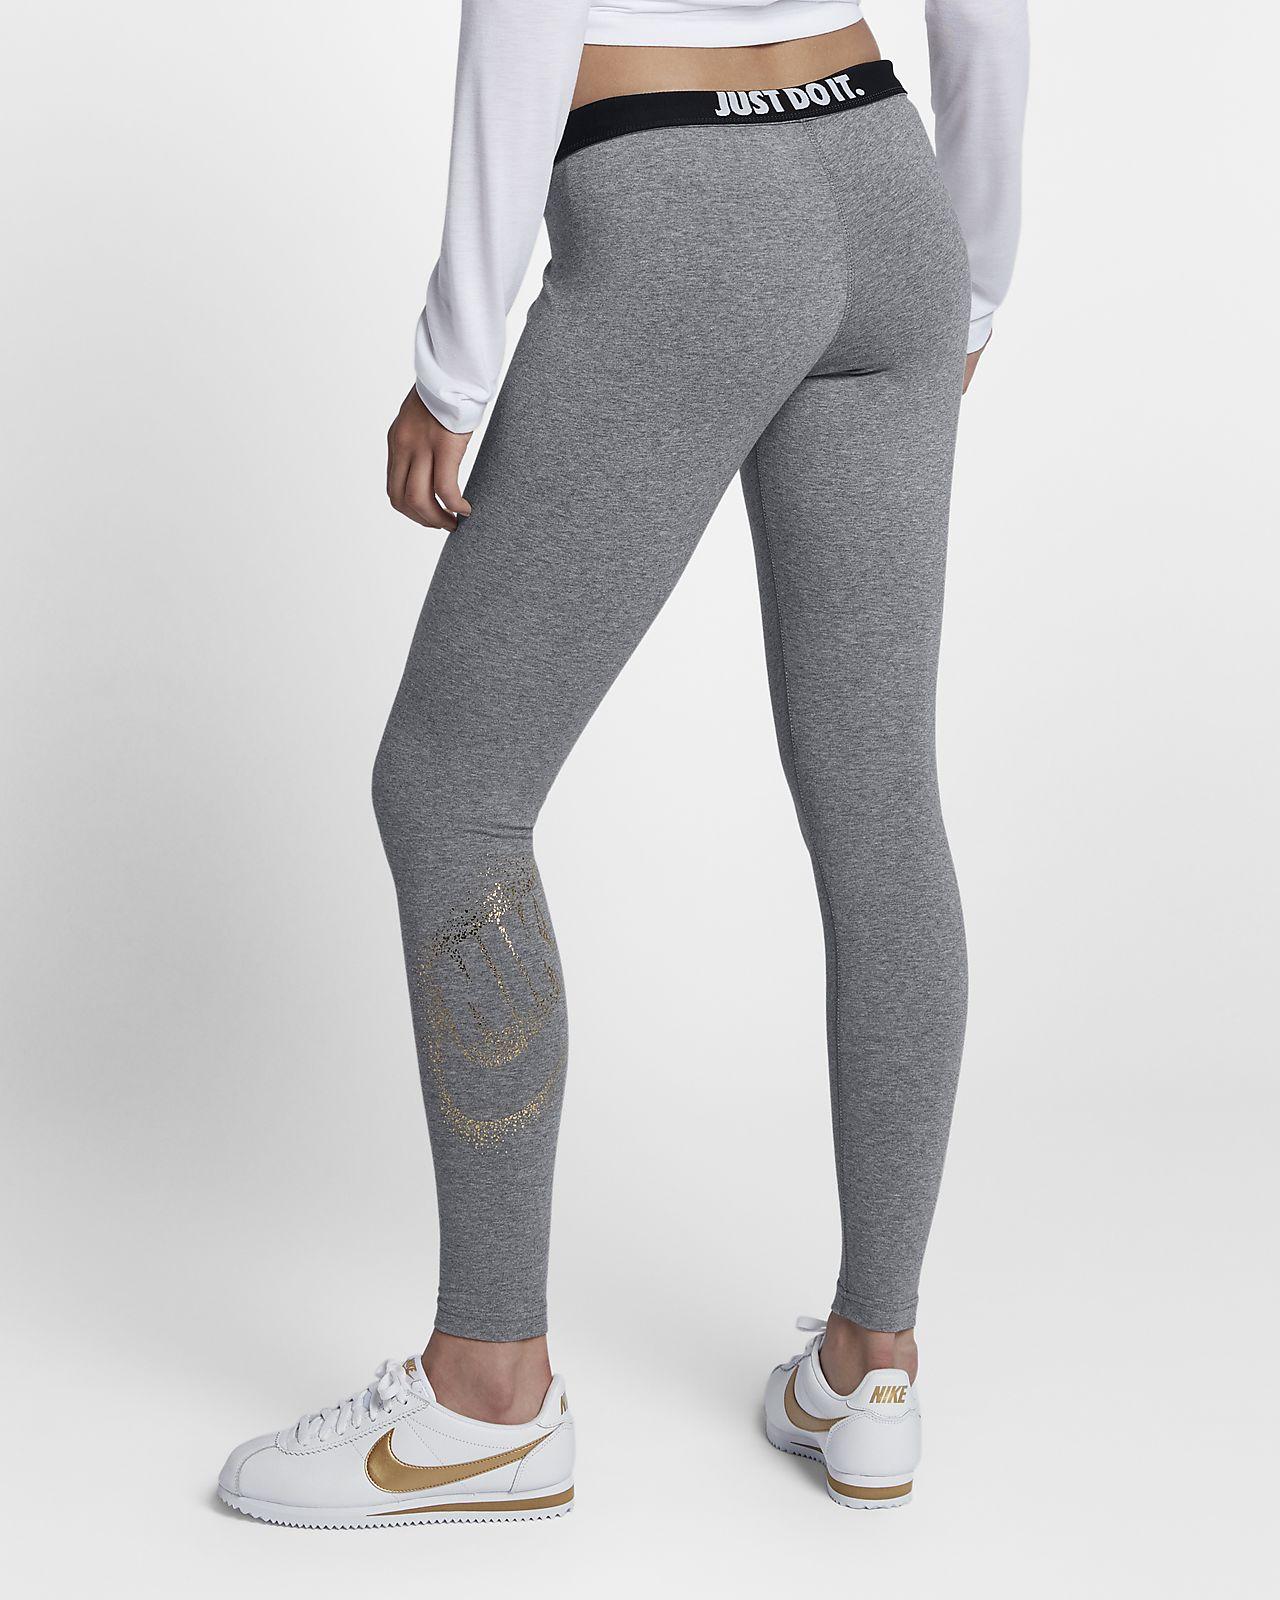 nike sportswear women 39 s metallic leggings ma. Black Bedroom Furniture Sets. Home Design Ideas